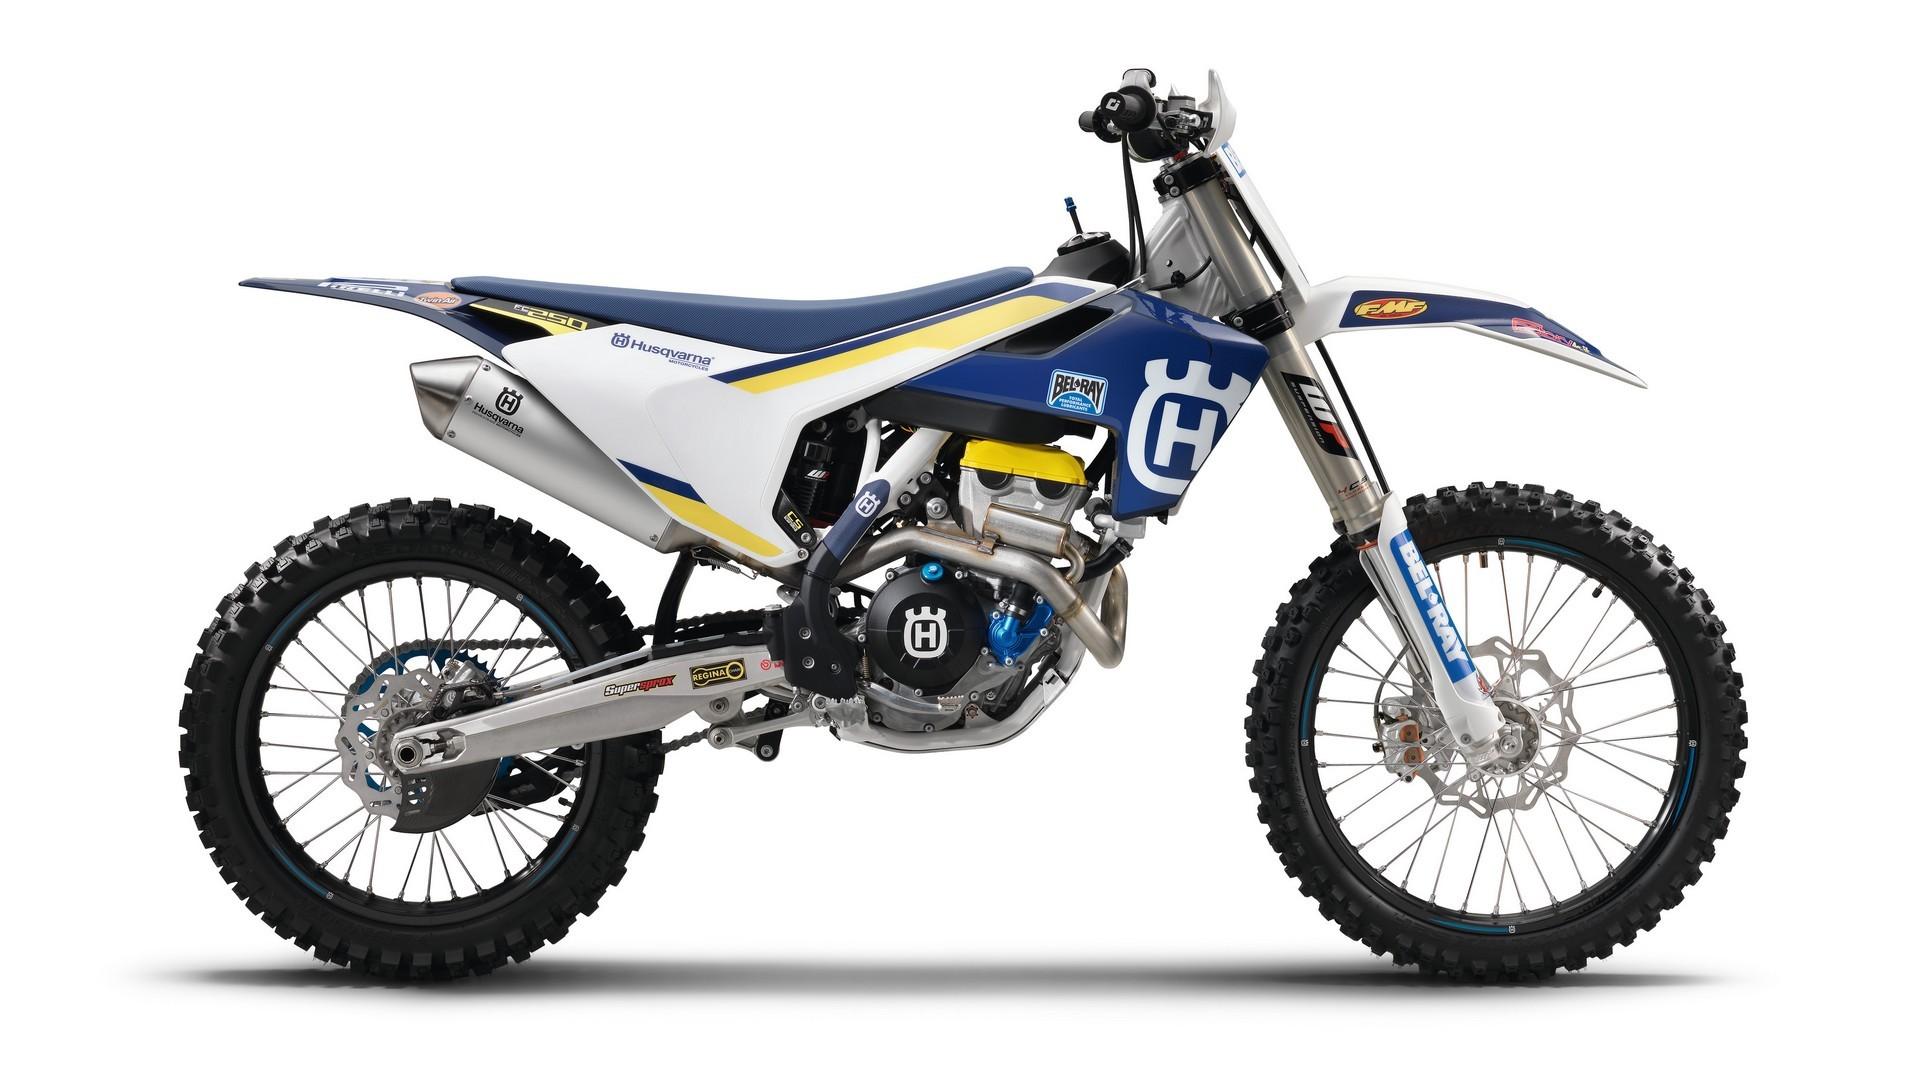 2016 husqvarna fc 250 motocross machines recalled need a